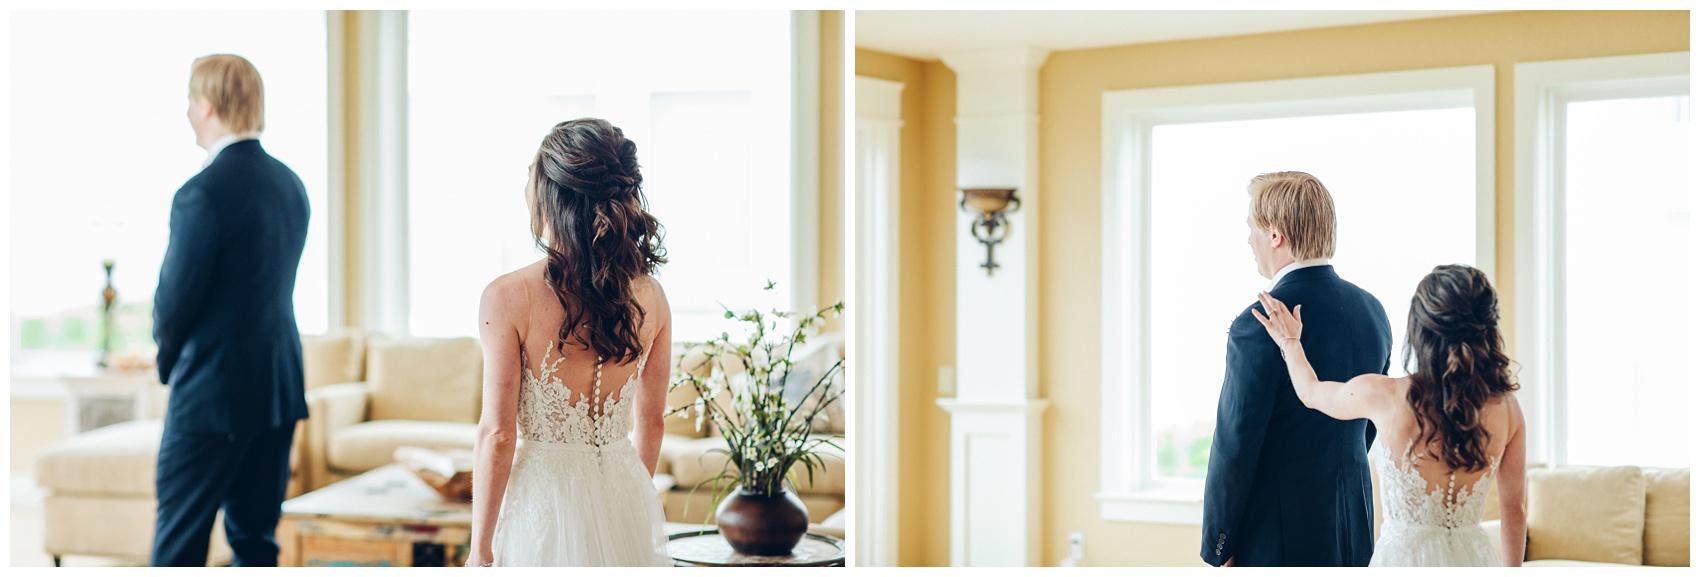 Outer-Banks-Corolla-Wedding_0038.jpg